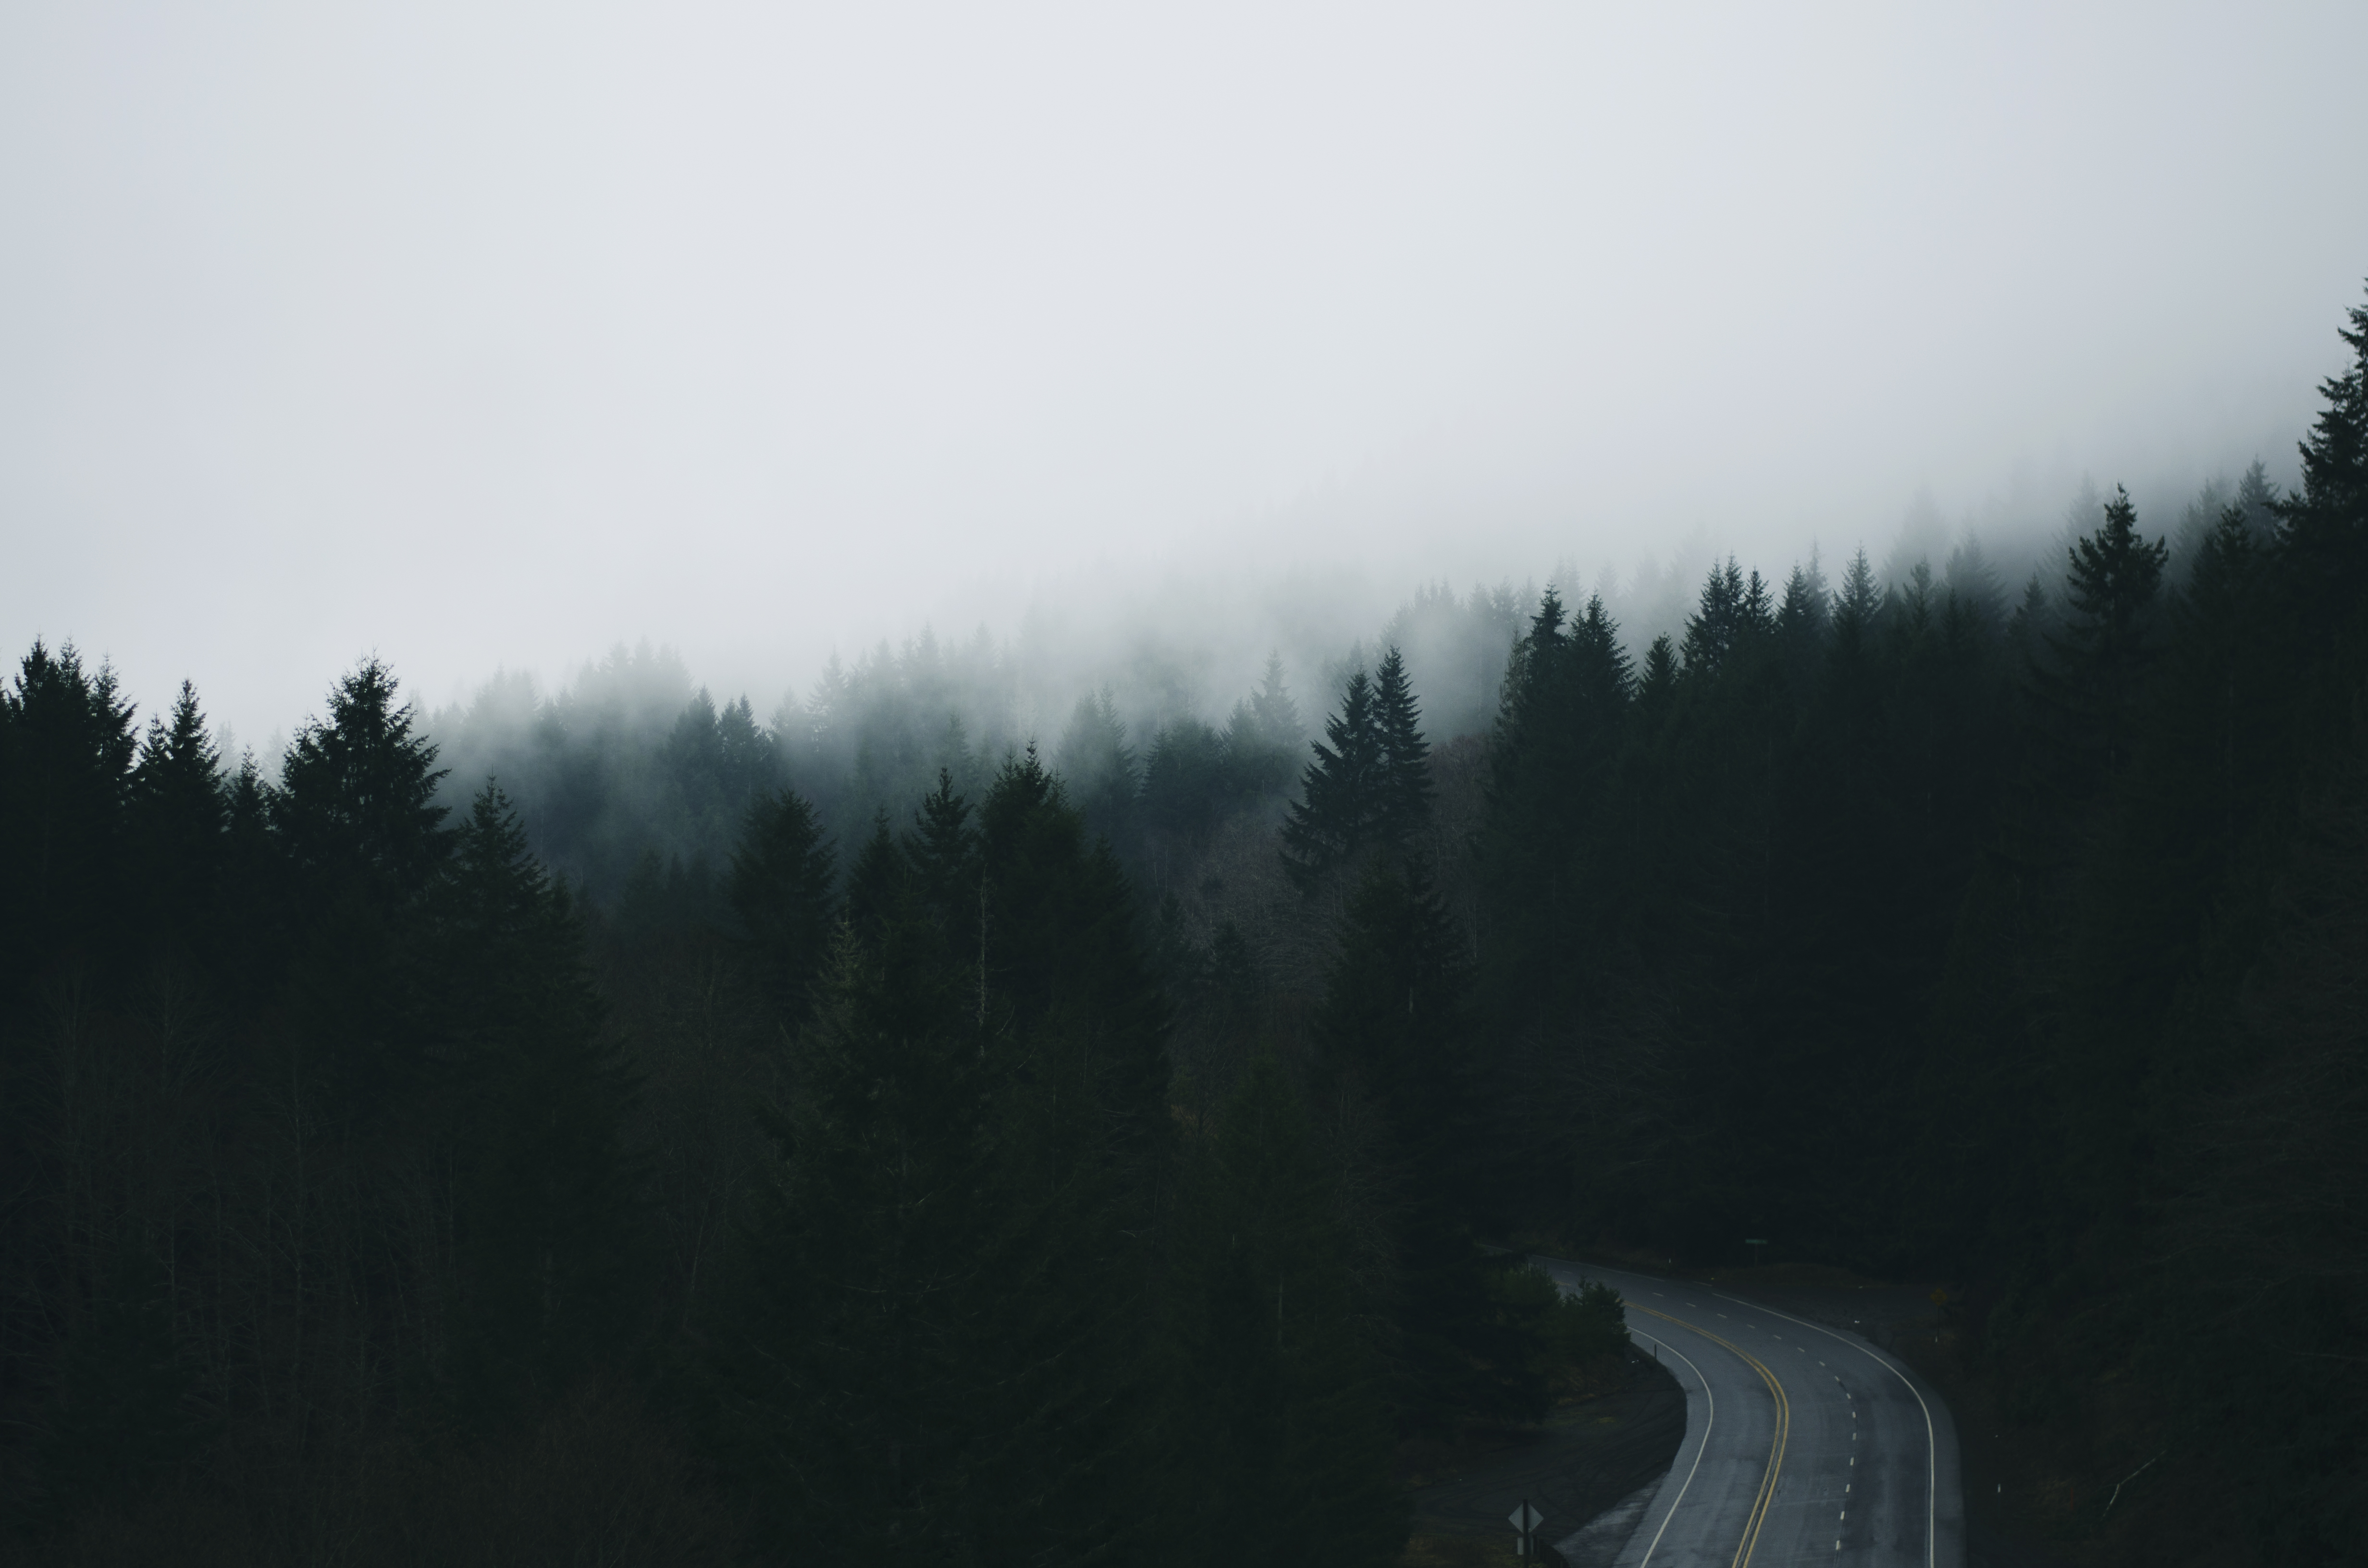 image gallery landscape tumblr